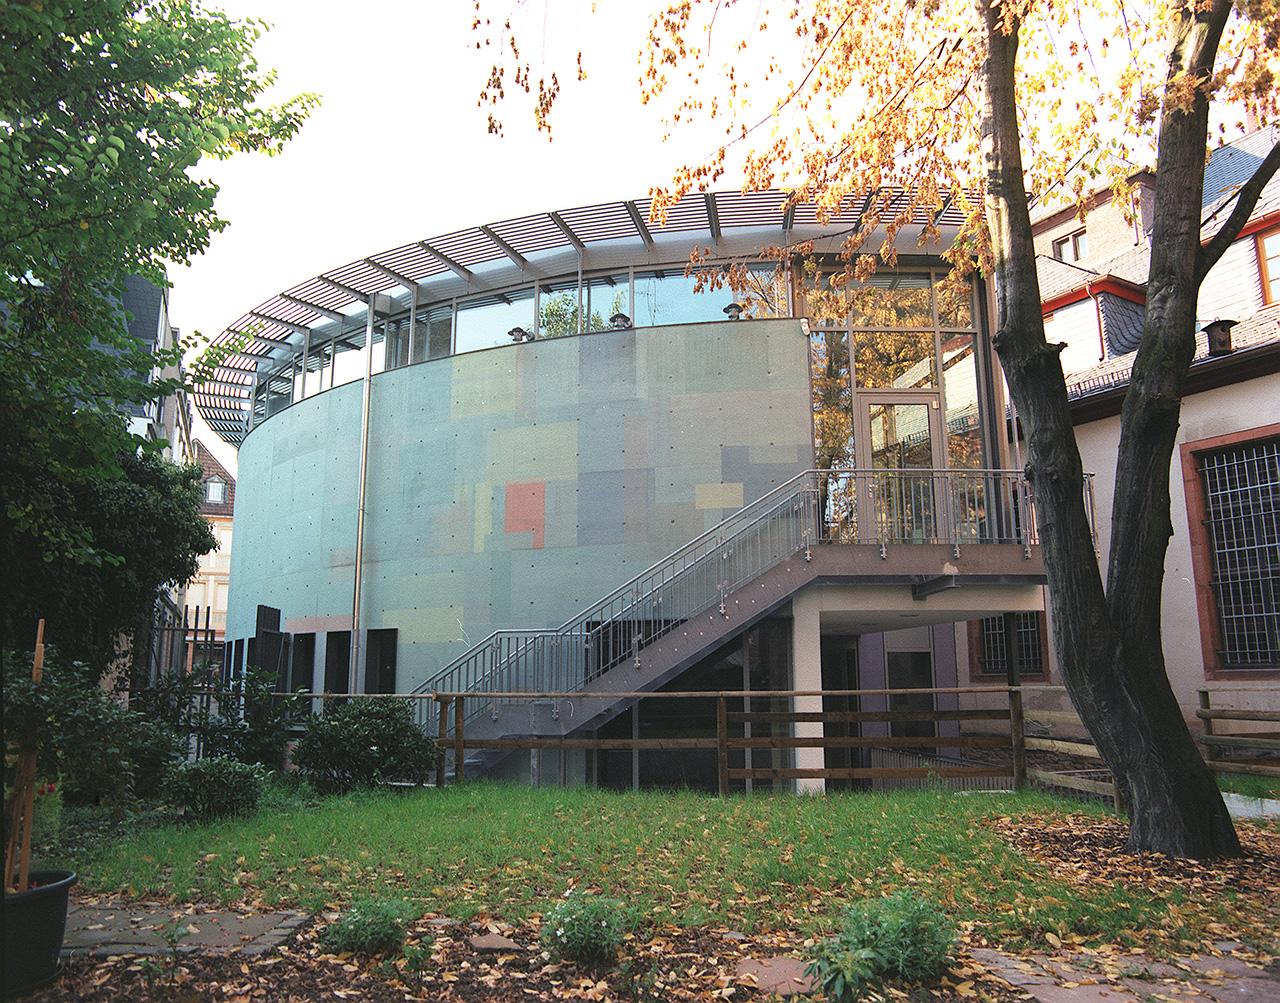 Domchor Mainz Farbgestaltung E. Münch, Architektur PAS MZ